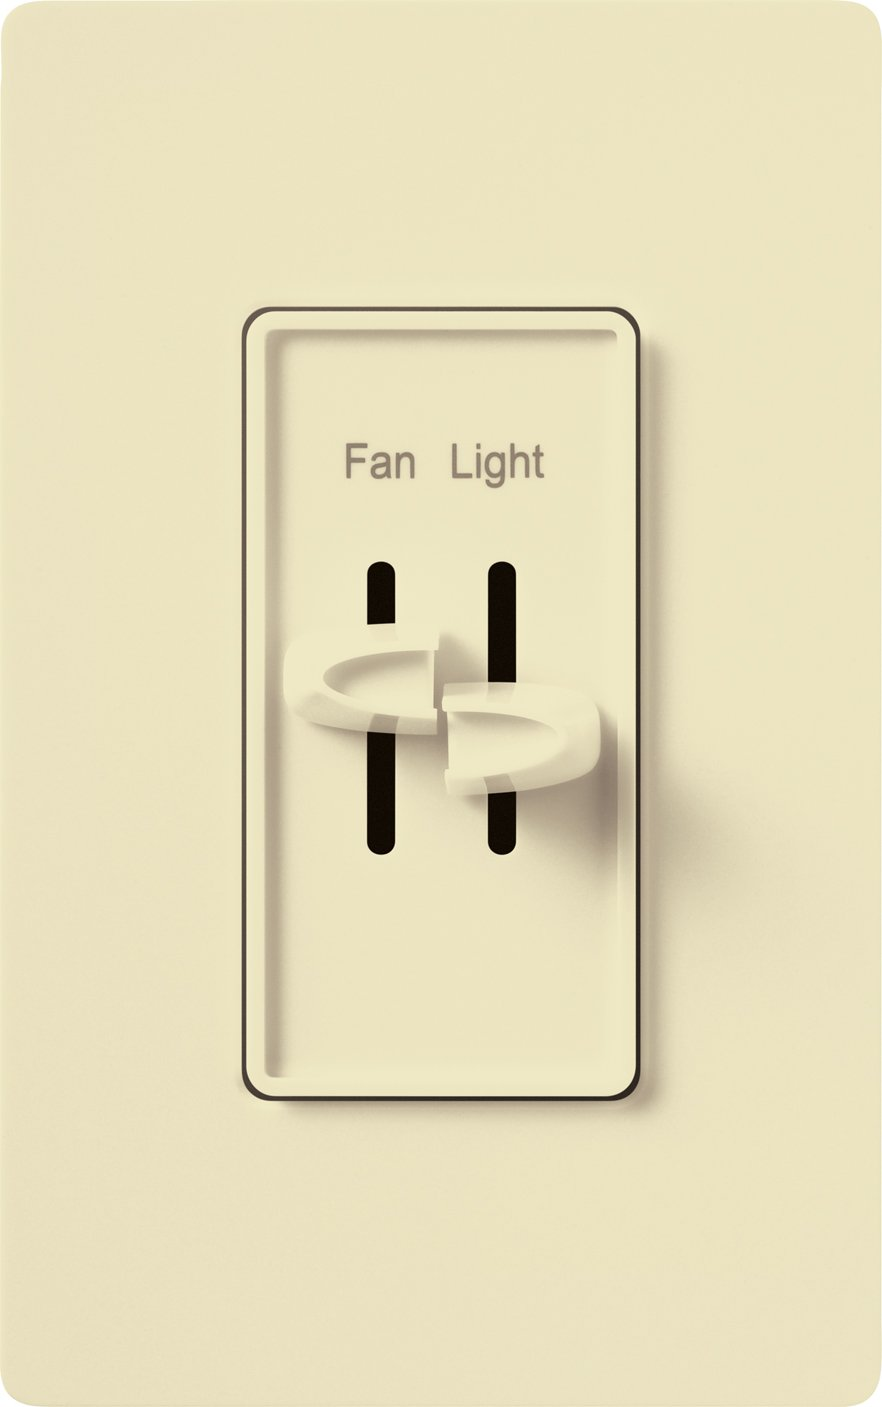 Lutron Skylark Fan Control and Light Dimmer for Incandescent and Halogen Bulbs, Single-Pole, S2-LF-AL, Almond Lutron Electronics Company Inc. LU S2-LF-AL